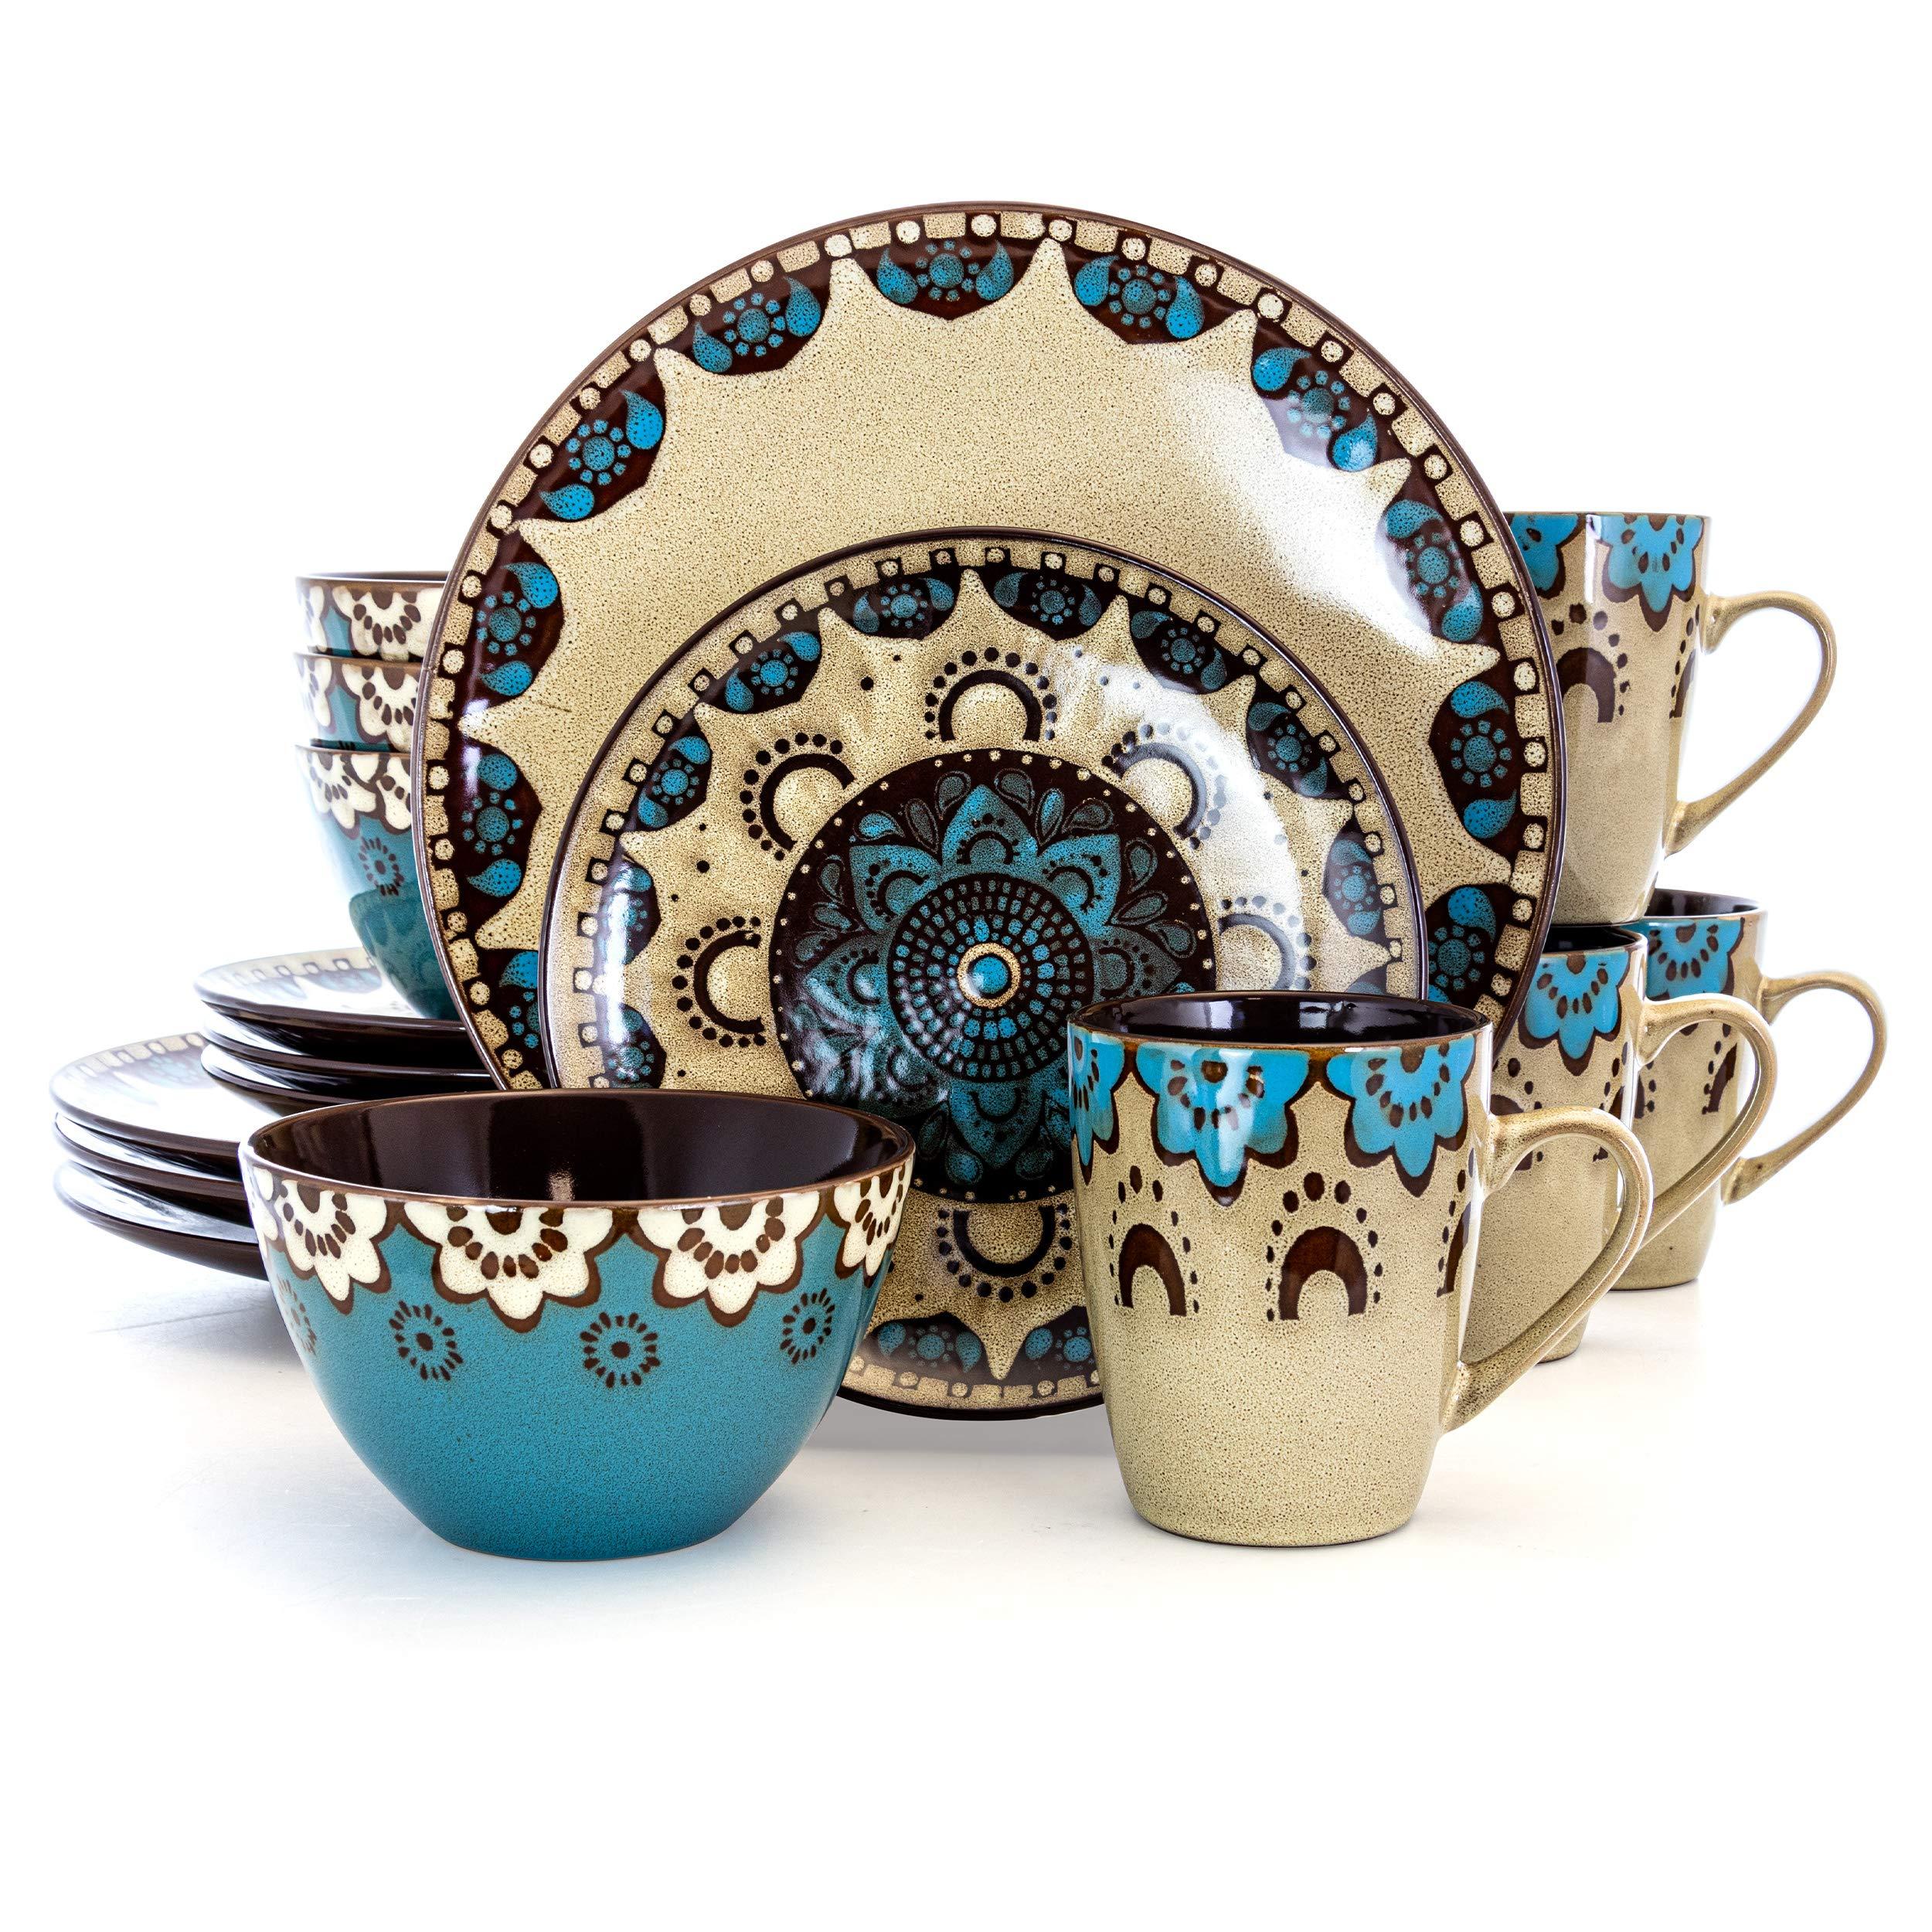 Elama CLAYHEART16 Luxurious Stoneware Dinnerware